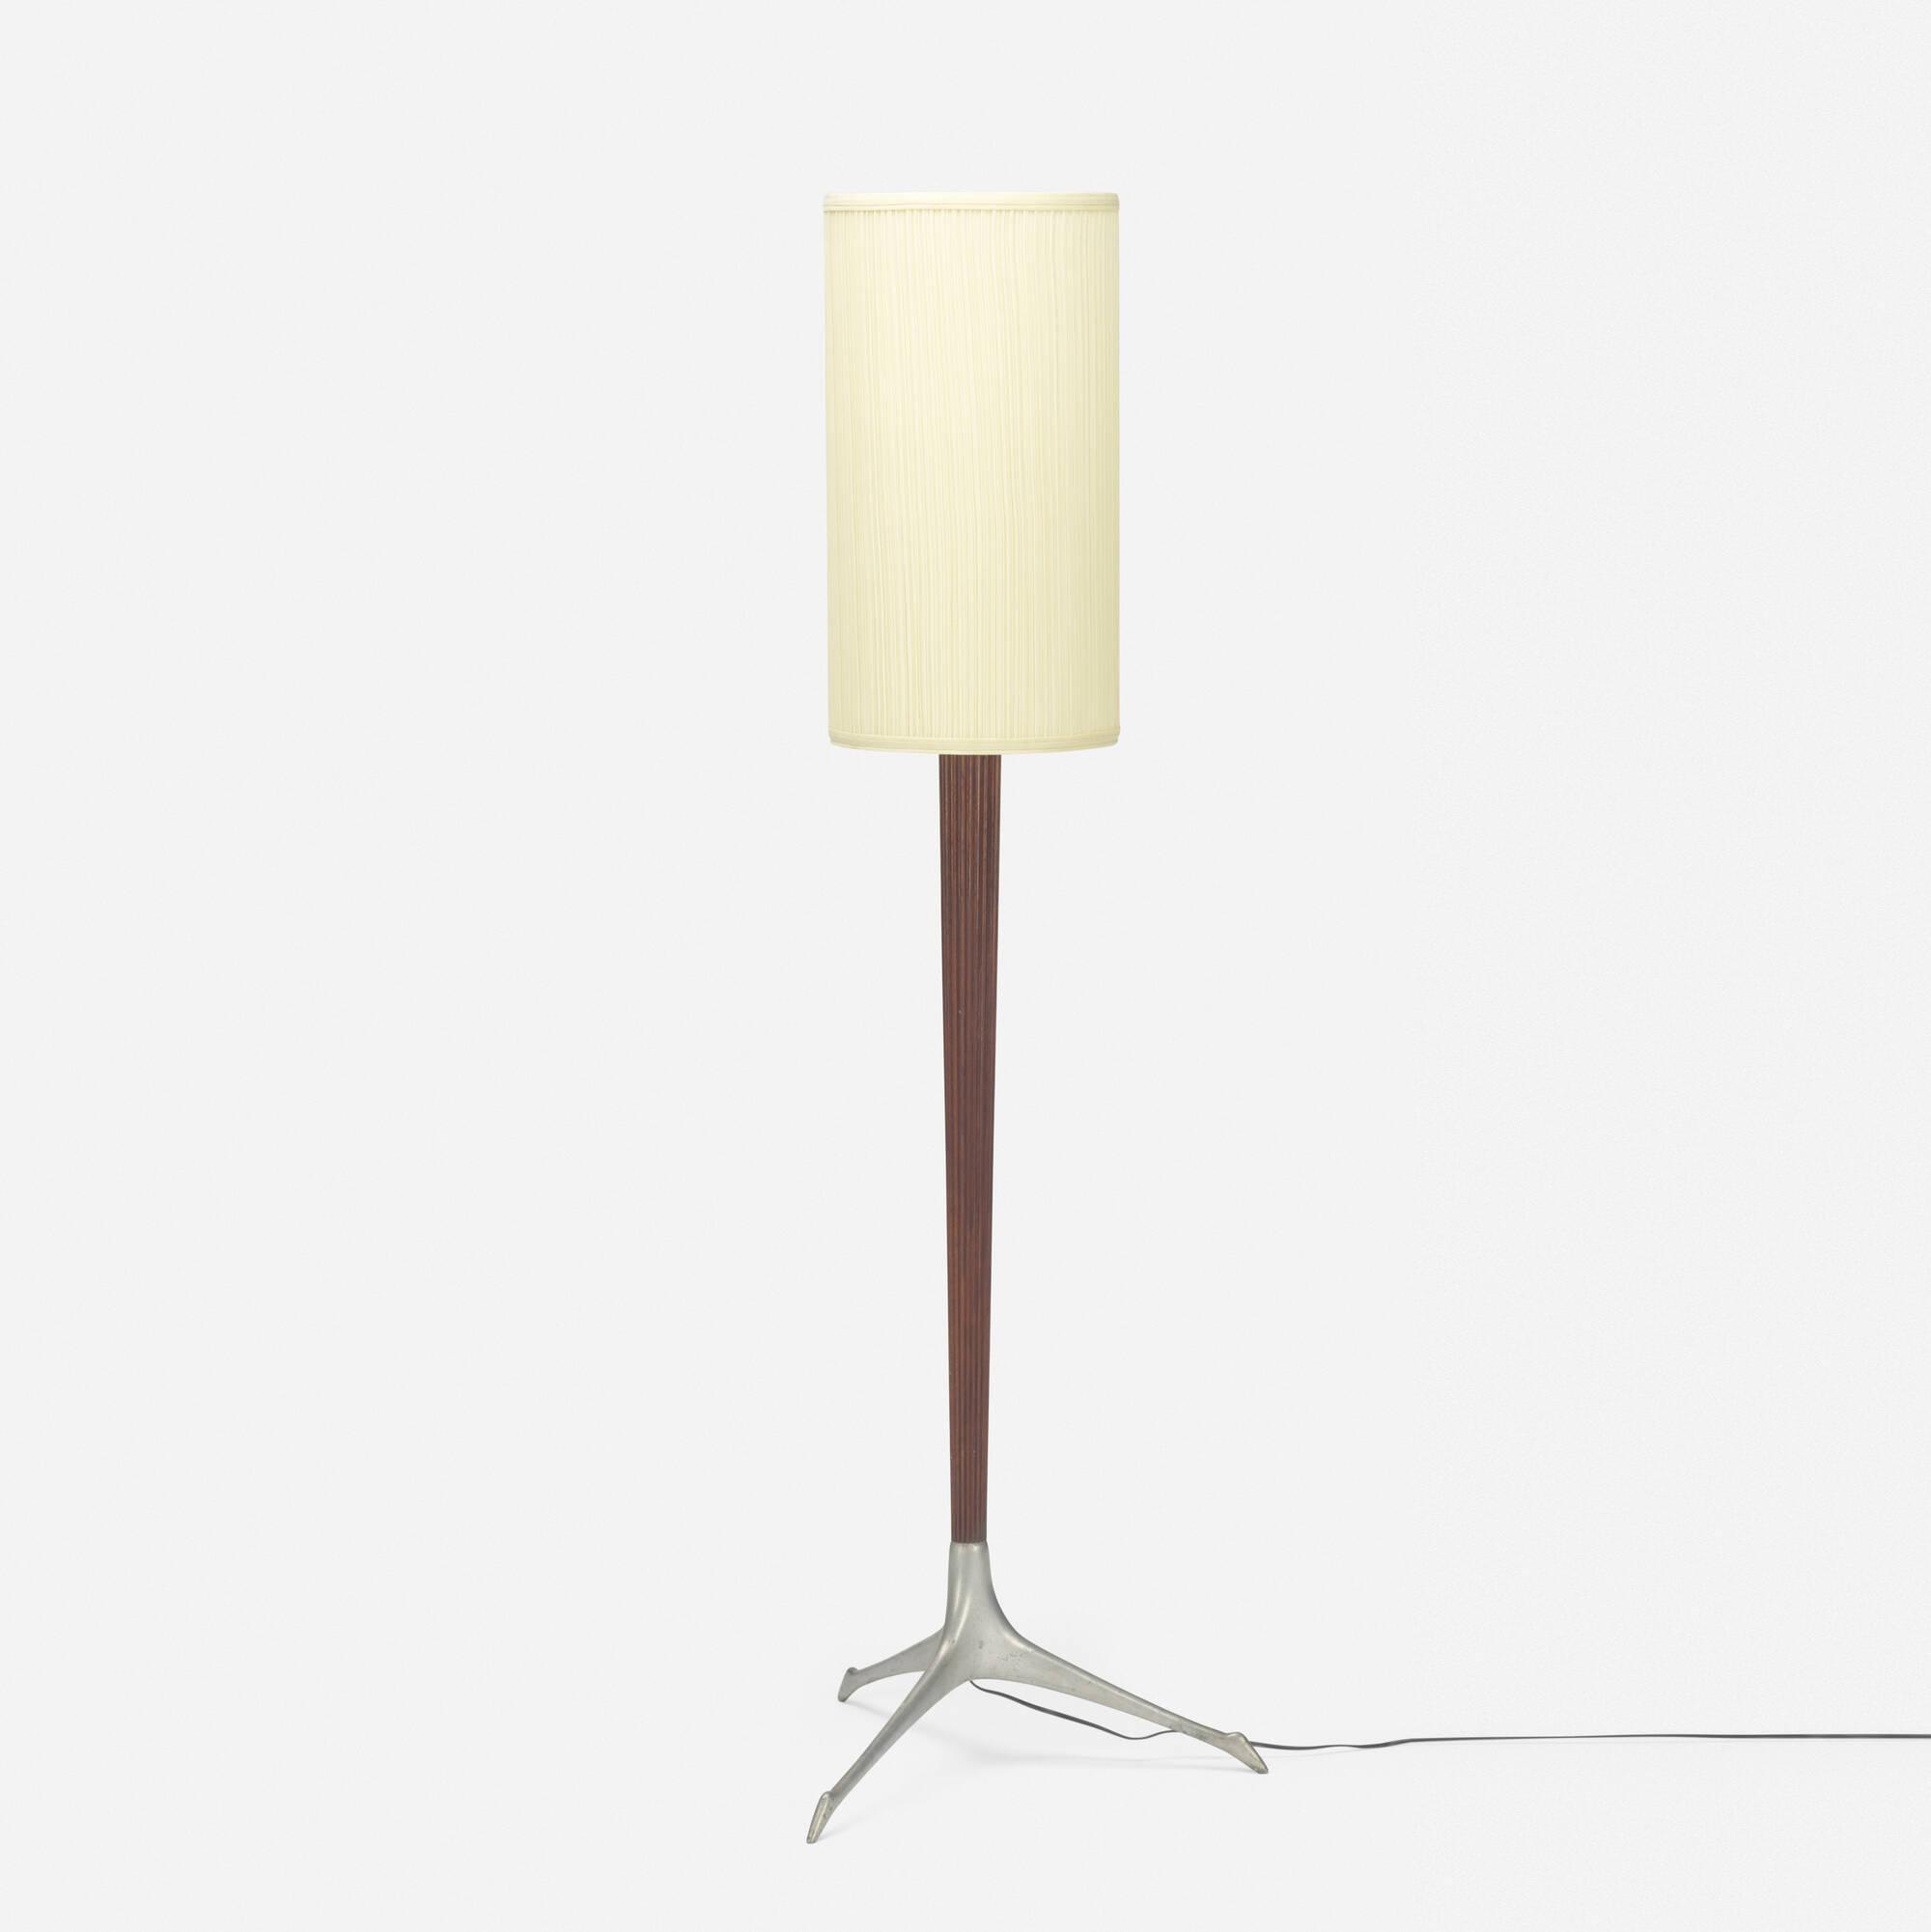 355: Vladimir Kagan / floor lamp (1 of 2)